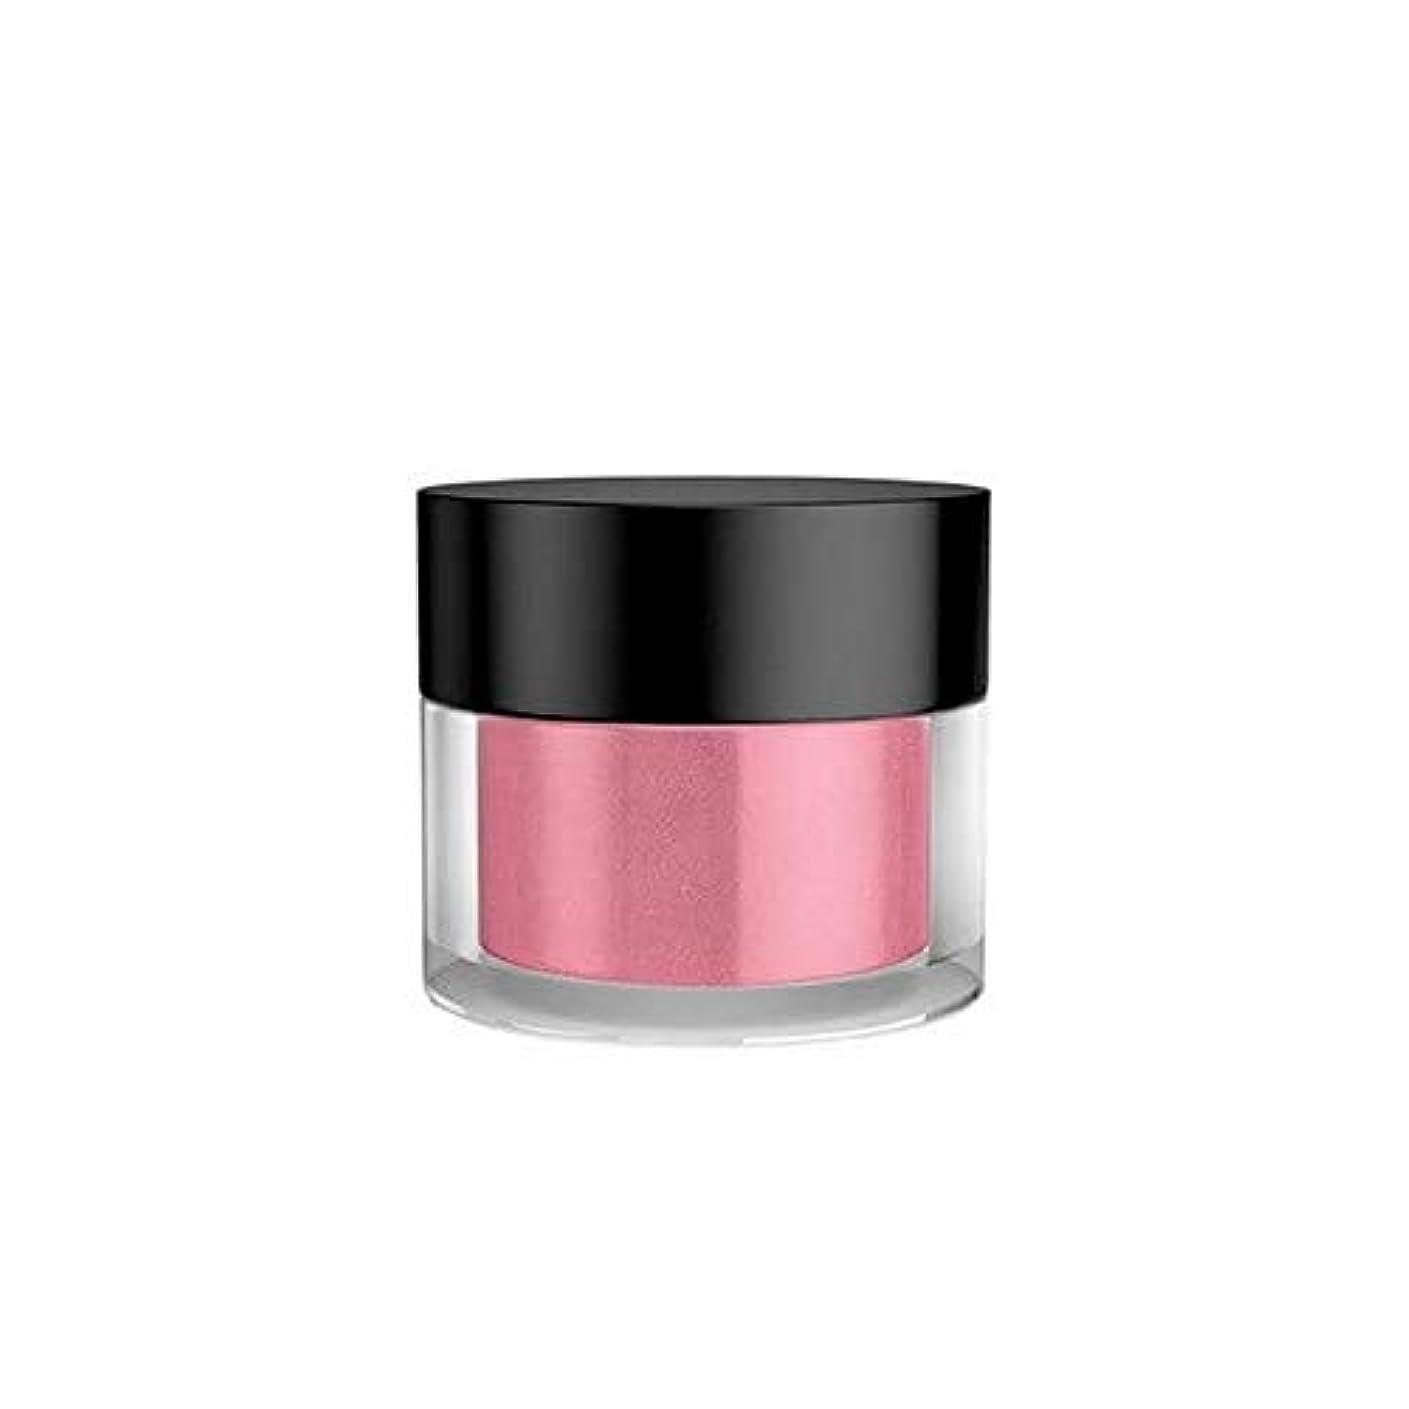 [GOSH ] おやっ効果粉末クロムは005をバラ - Gosh Effect Powder Chrome Rose 005 [並行輸入品]